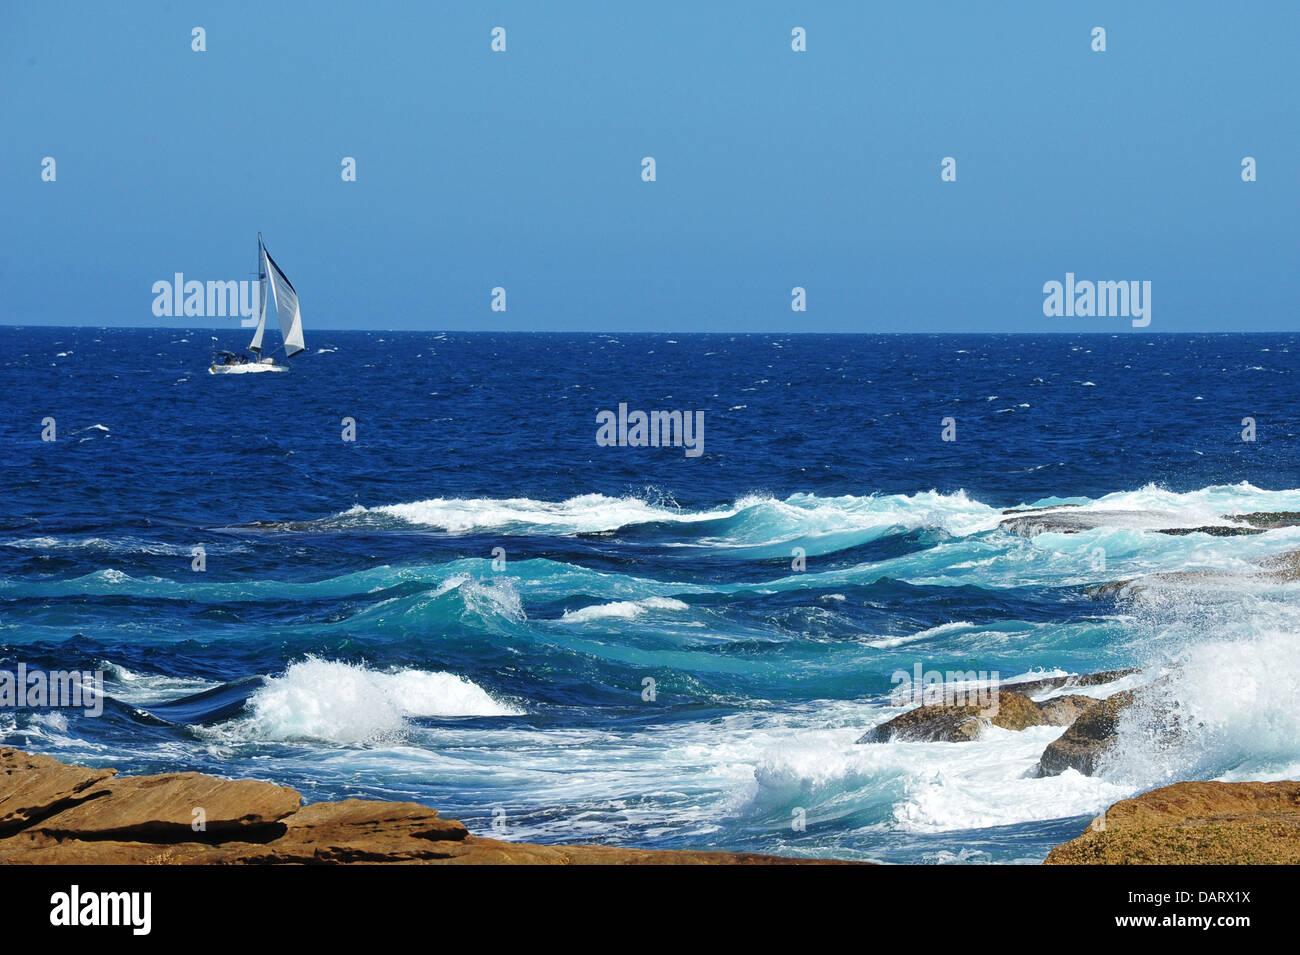 Yate en la costa con mar gruesa Foto de stock